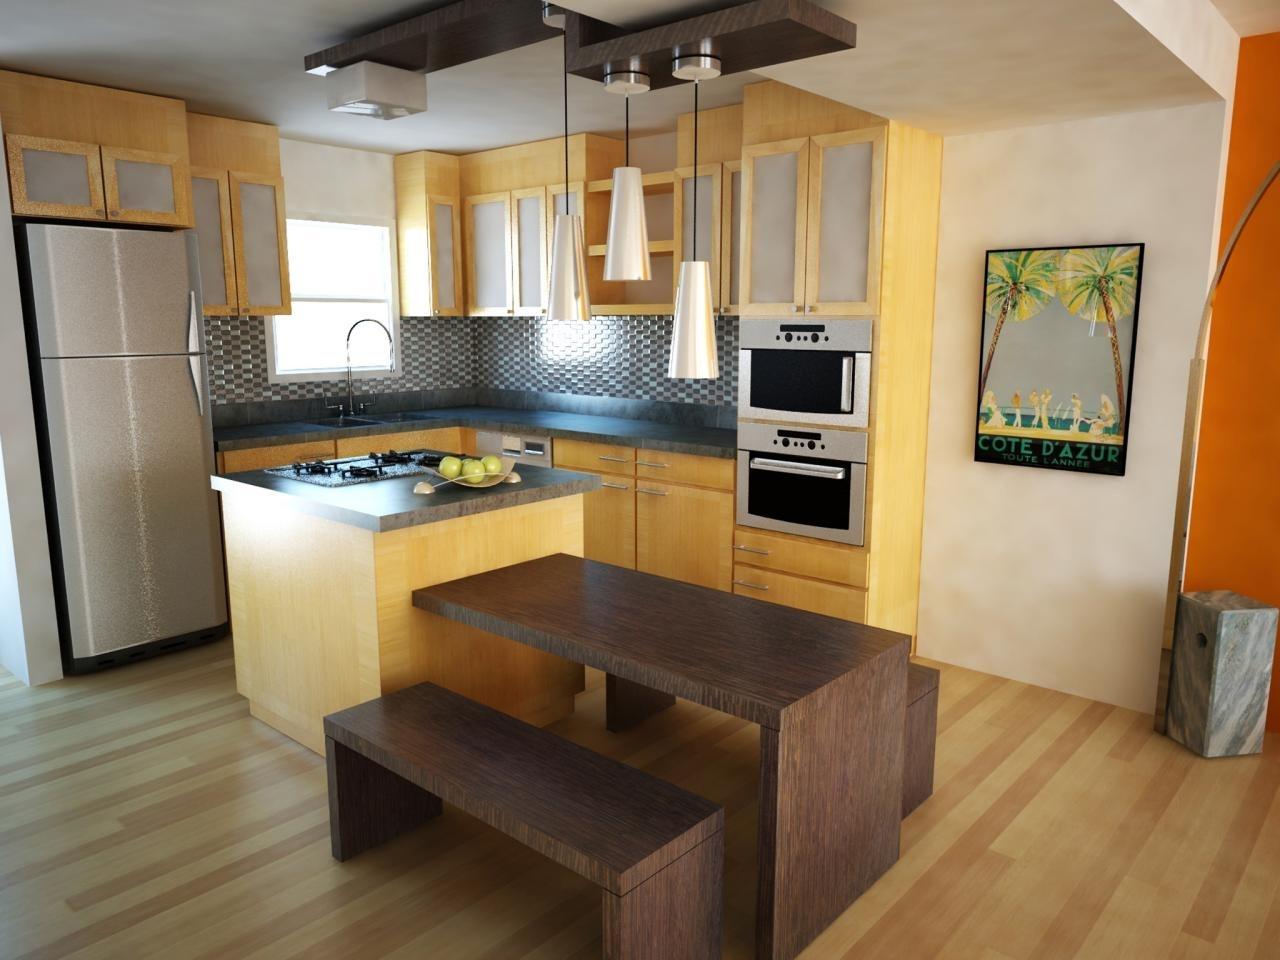 10 Fashionable Kitchen Layout Ideas With Island %name 2021